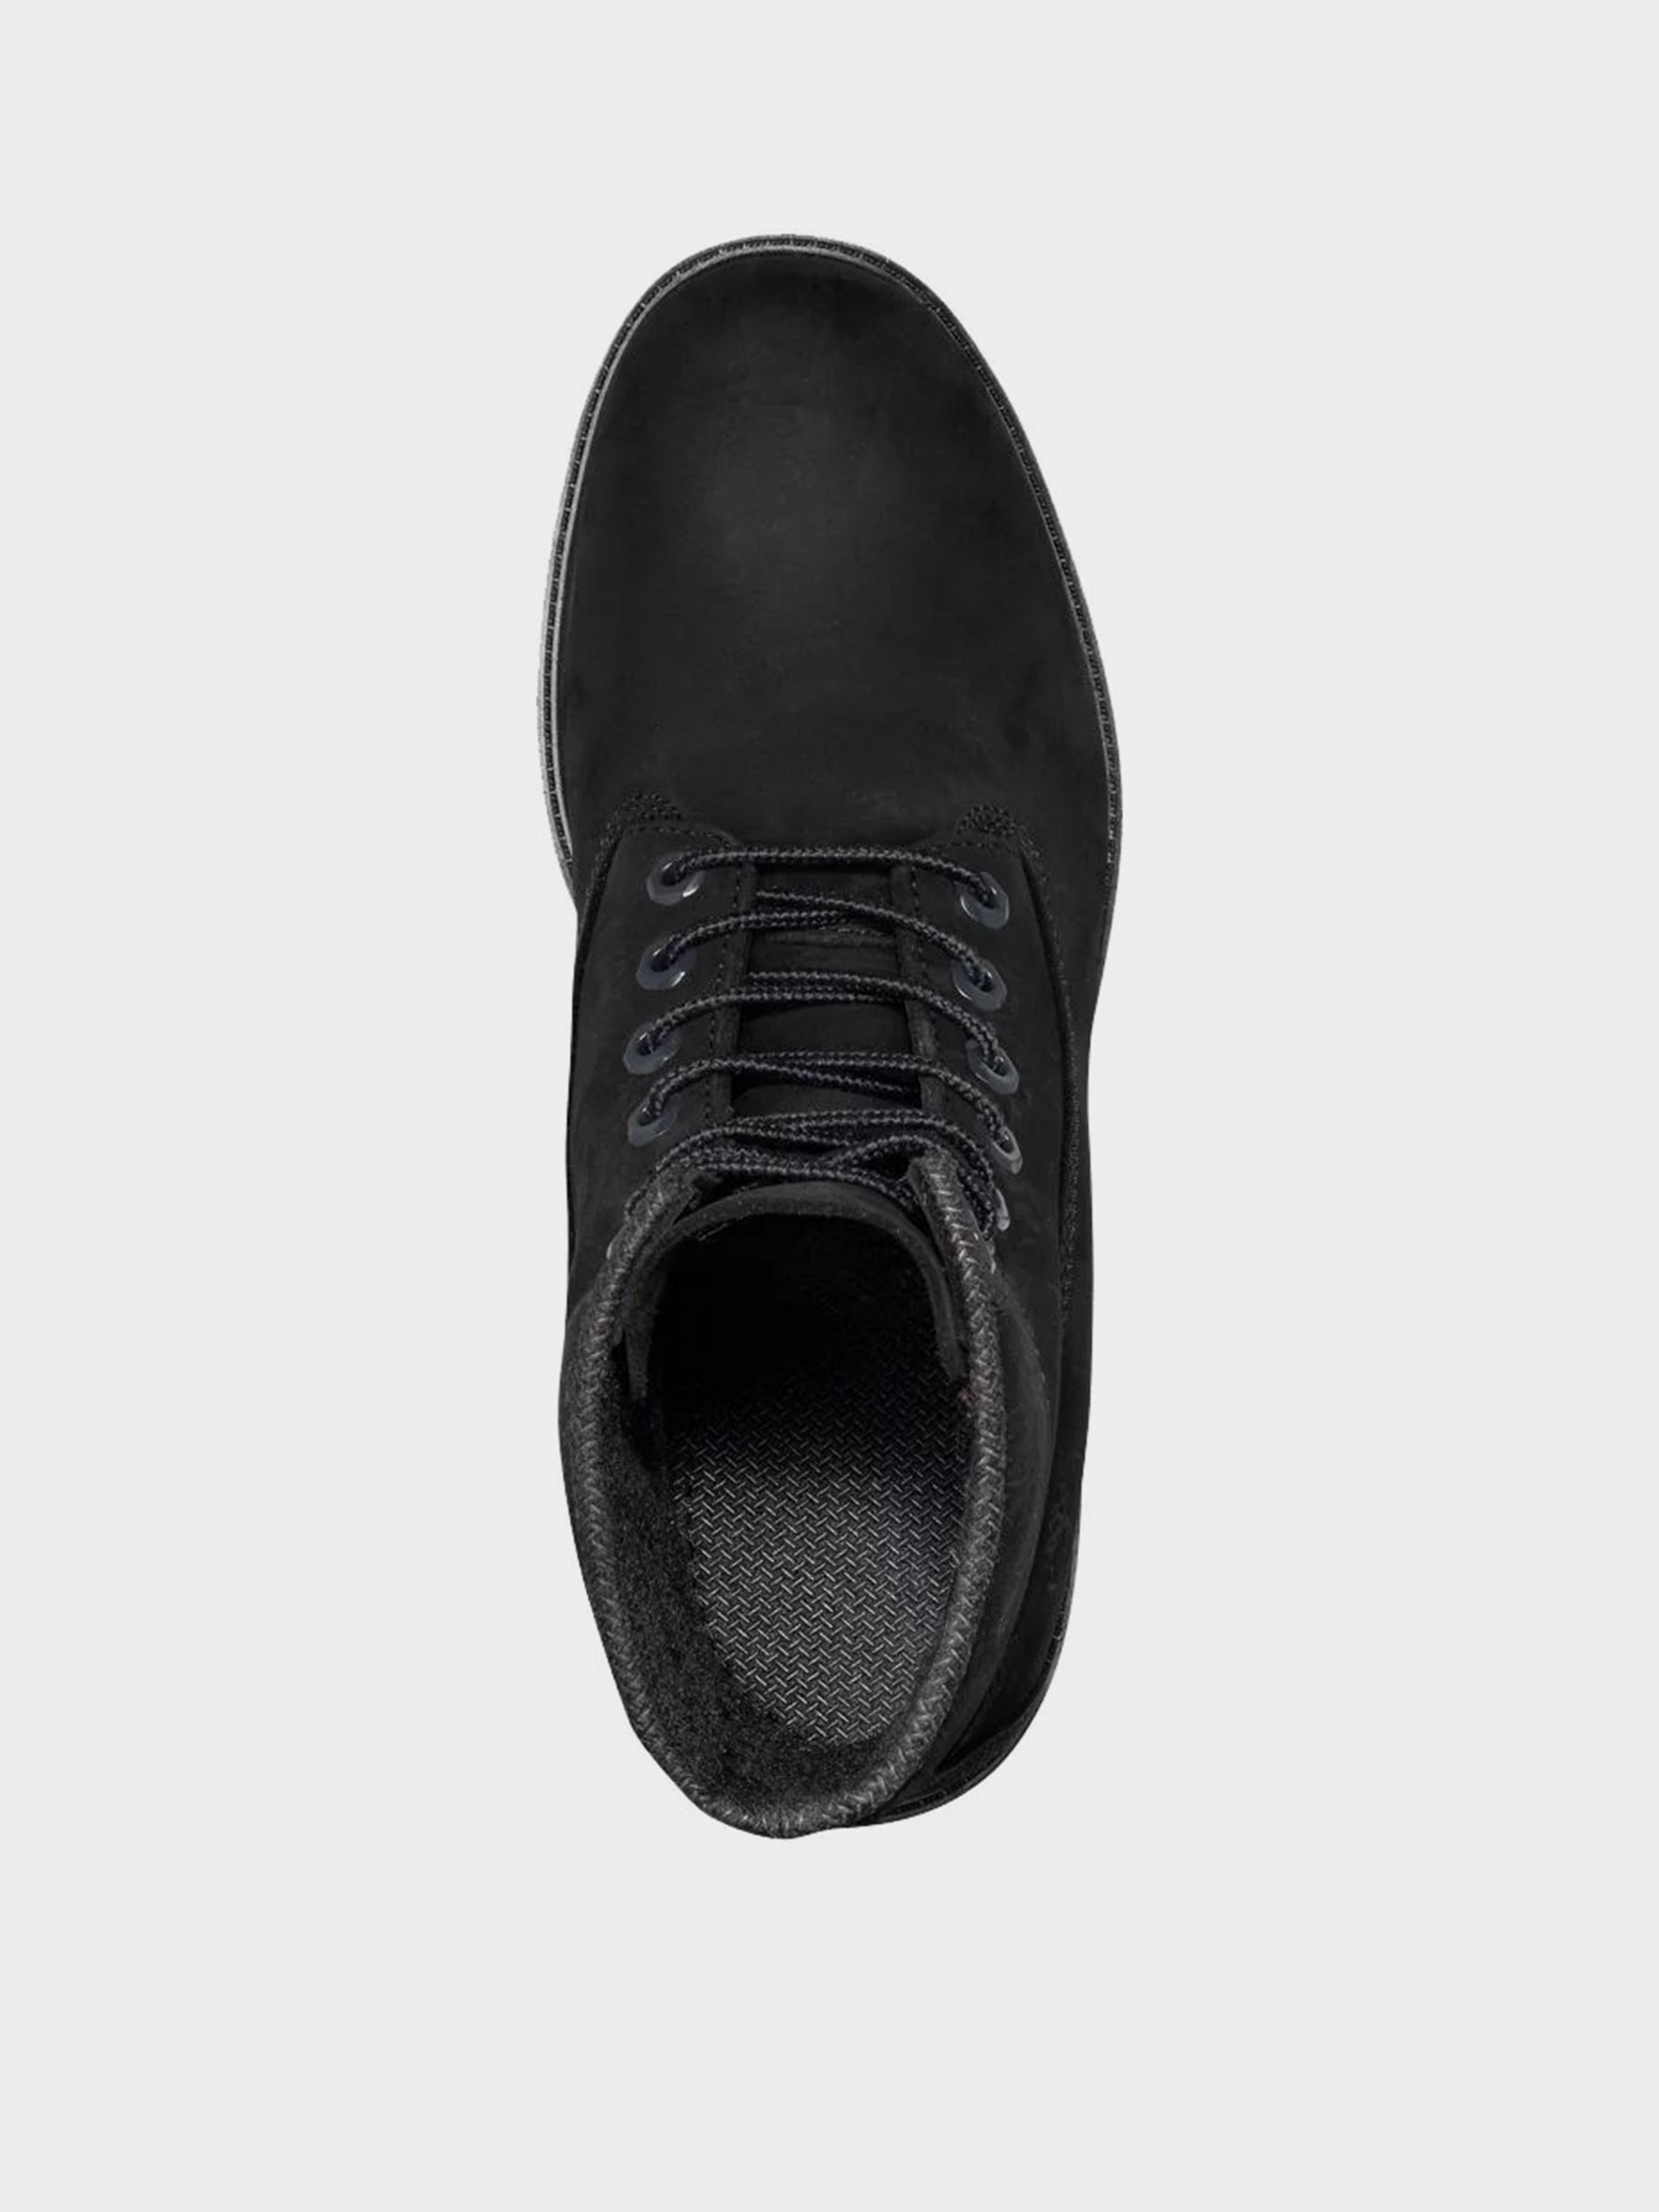 Ботинки для мужчин Timberland Timberland Classic TF4064 смотреть, 2017